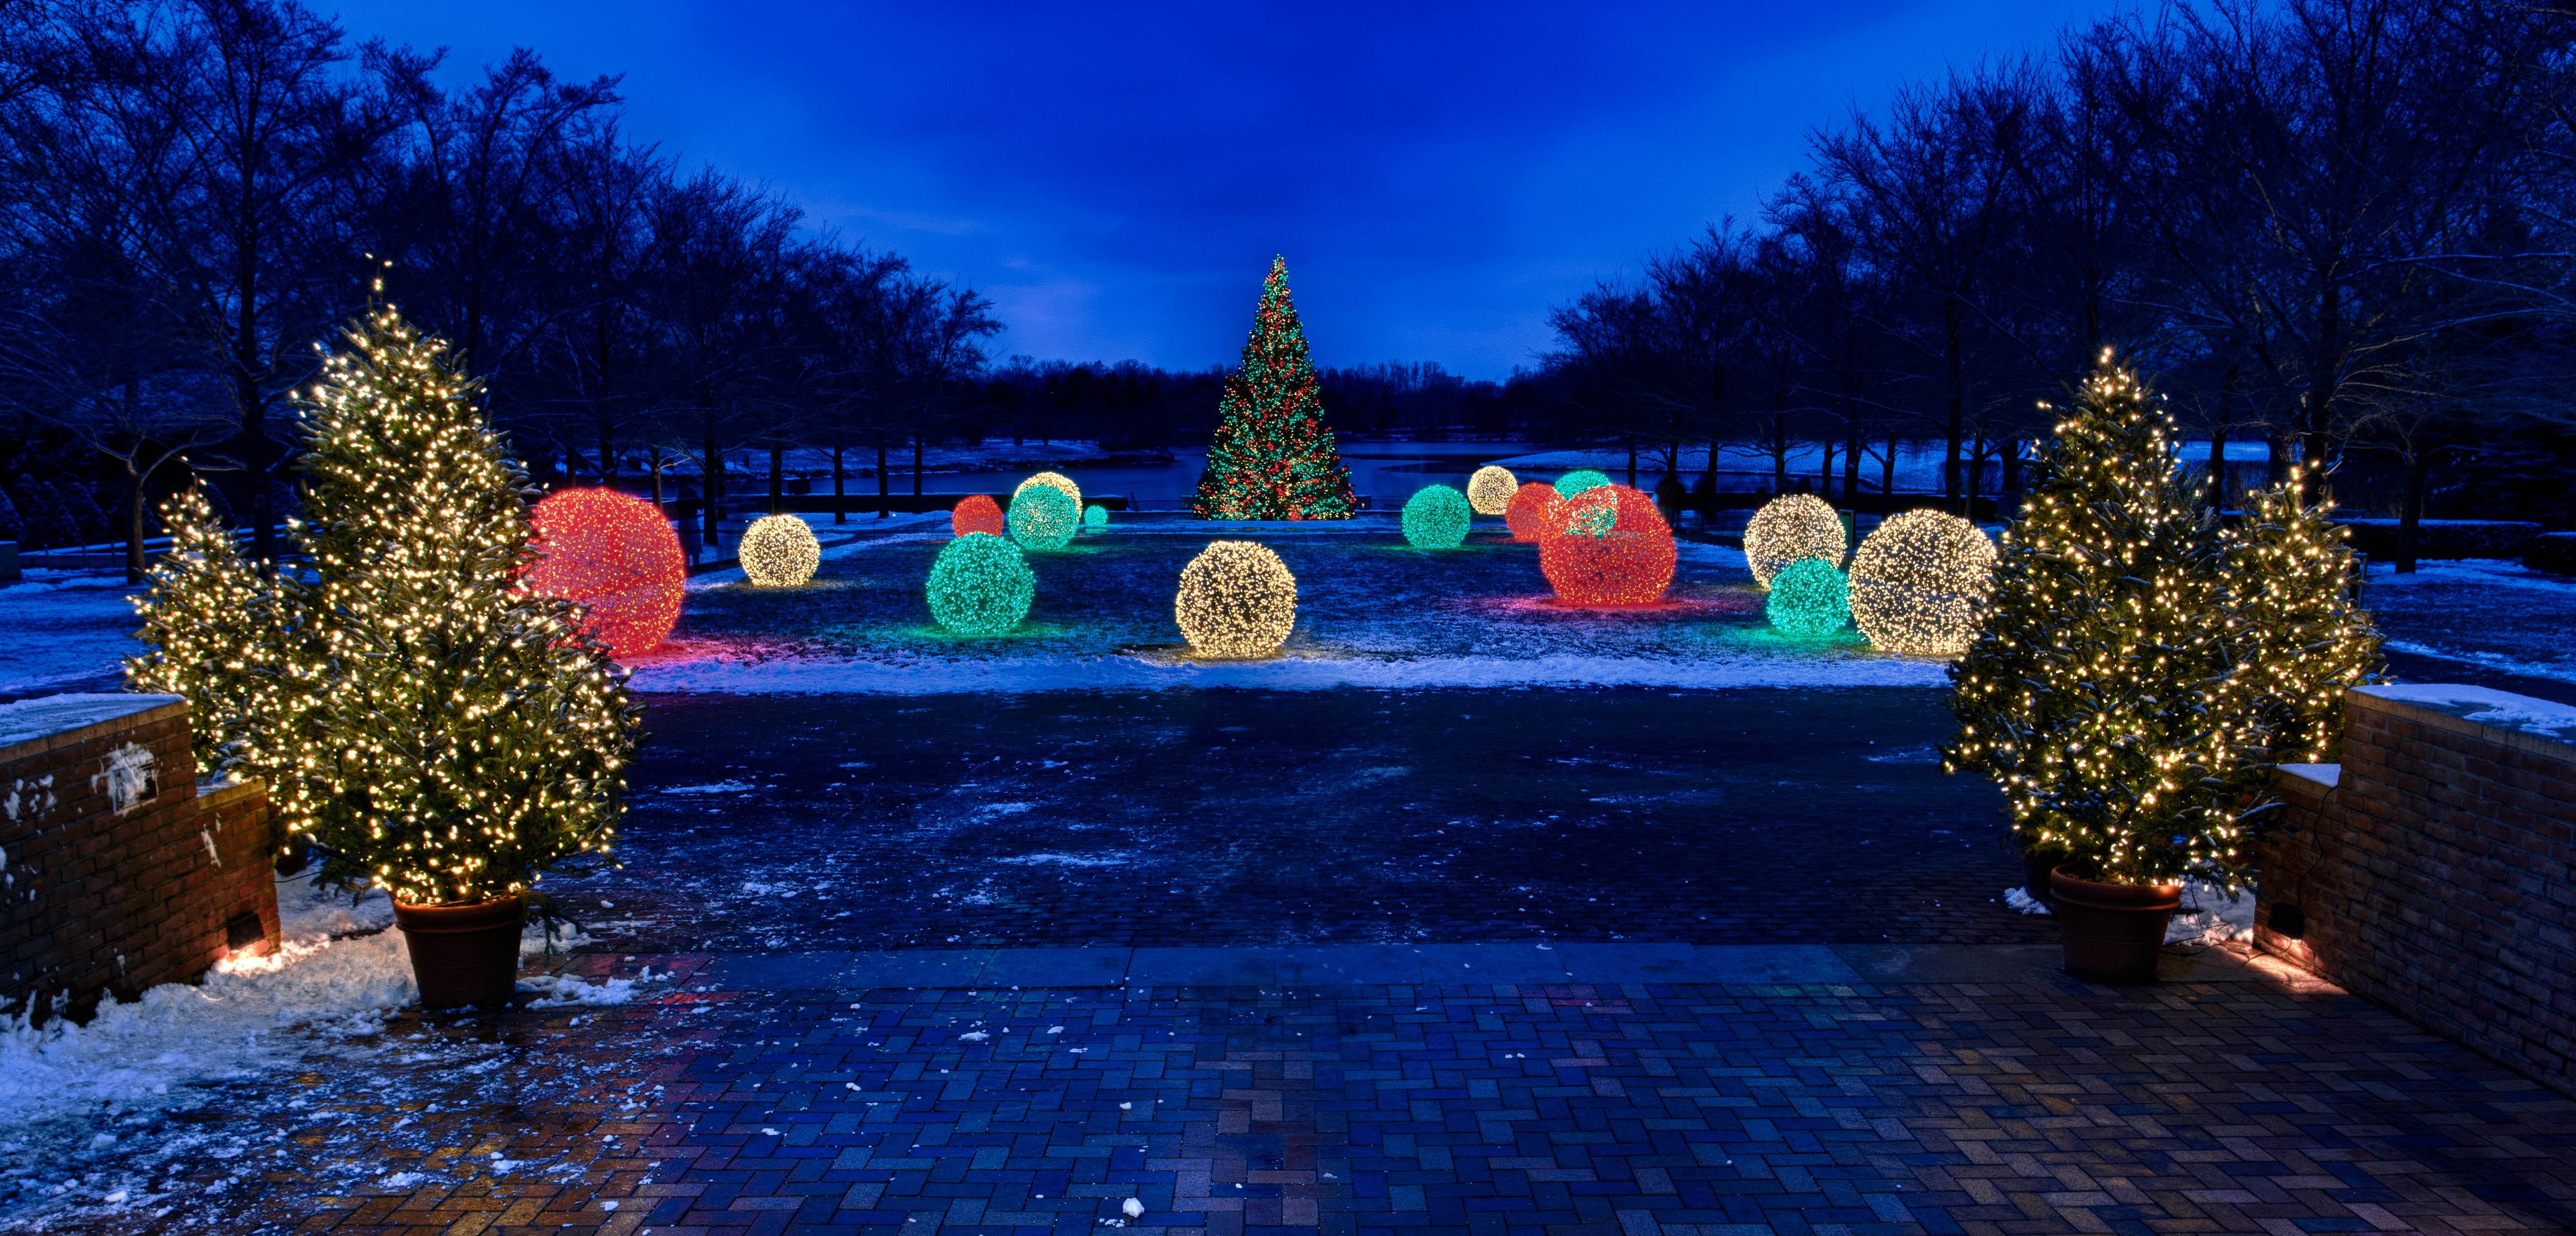 Chicago Botanic Garden Holiday Lights Flickr Photo Sharing